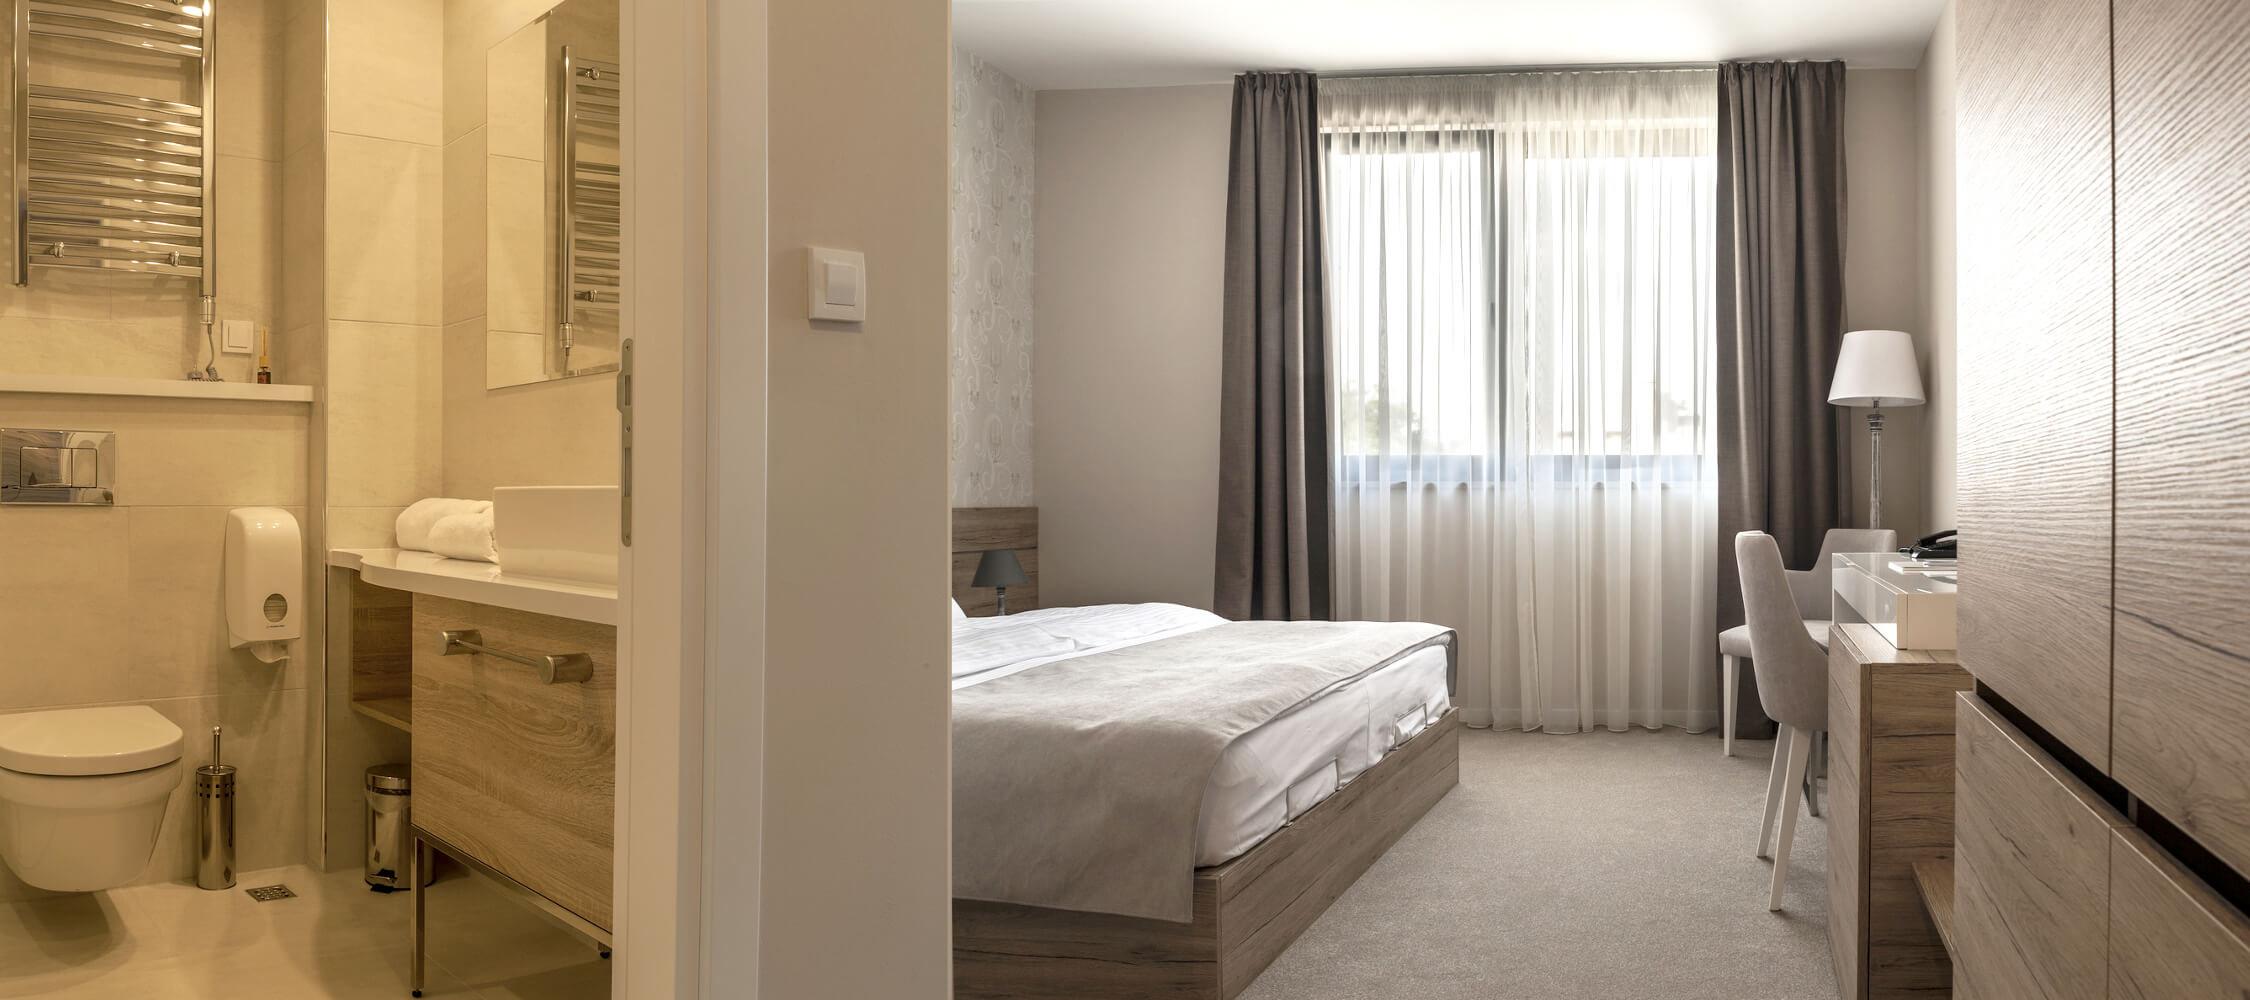 Hotel_Flora_Merano_Rooms_Superior_Doppelzimmer_Olivia_119853032_2250x1000